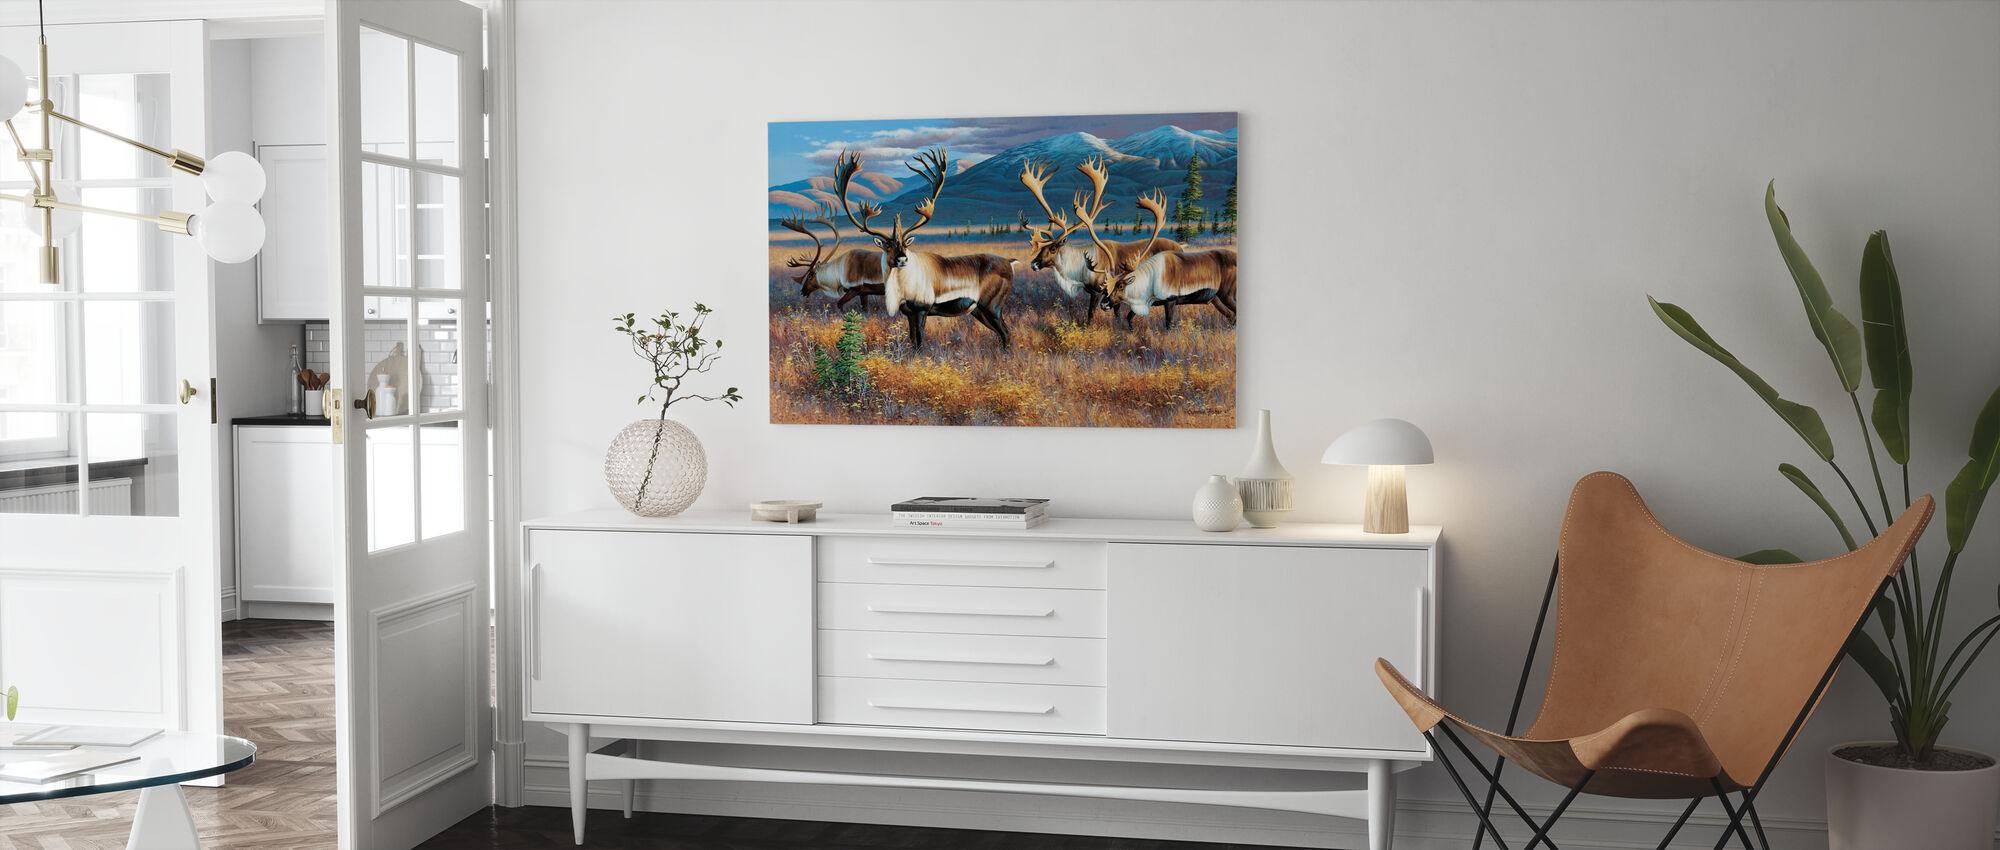 Northern Nomads - Canvas print - Living Room